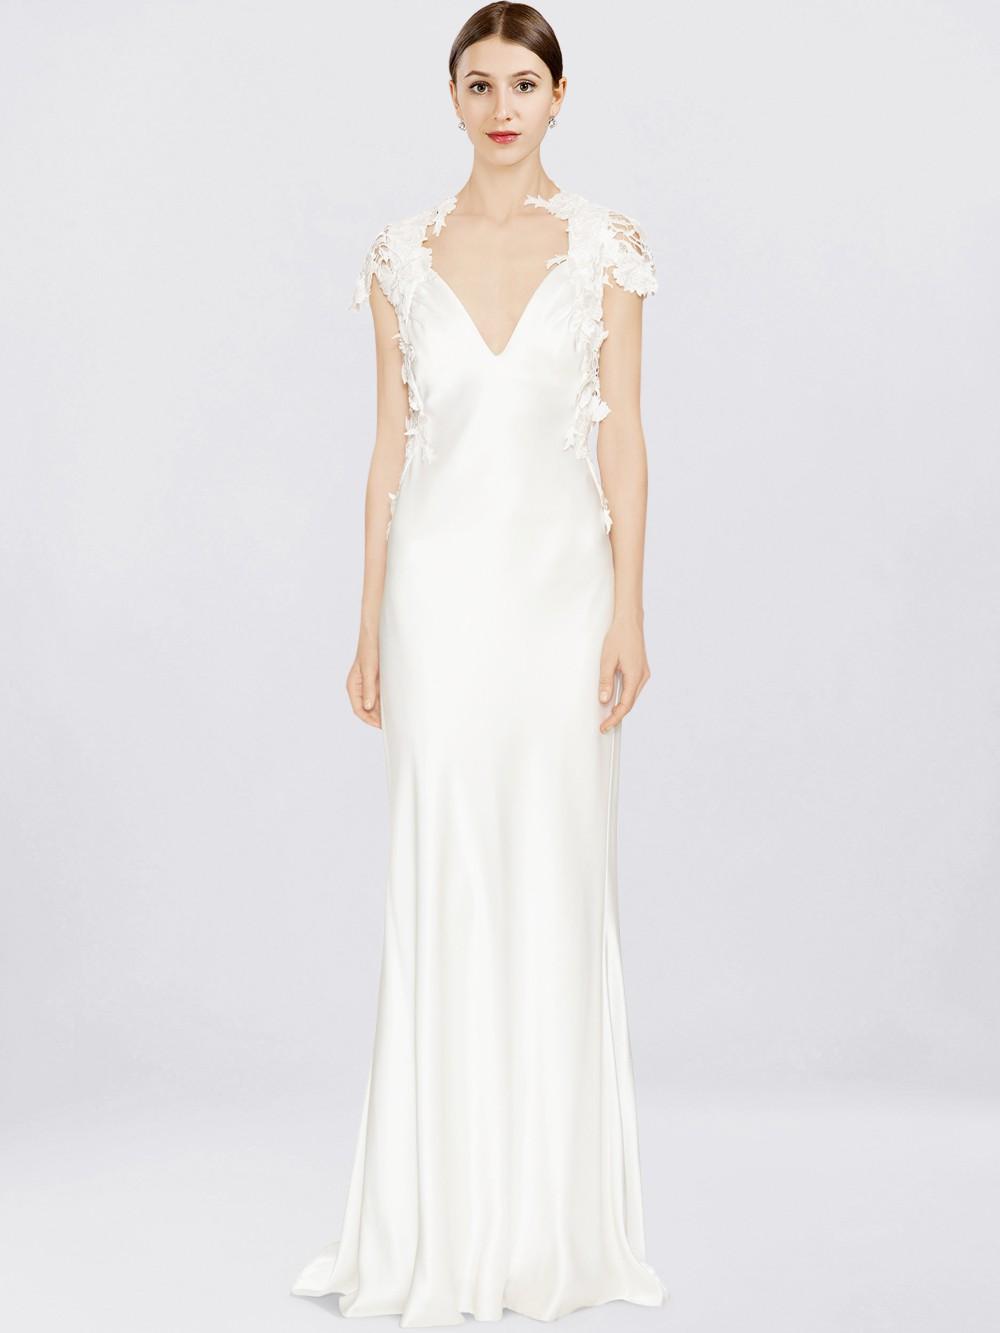 Lace Cap Sleeve Wedding Dress $239